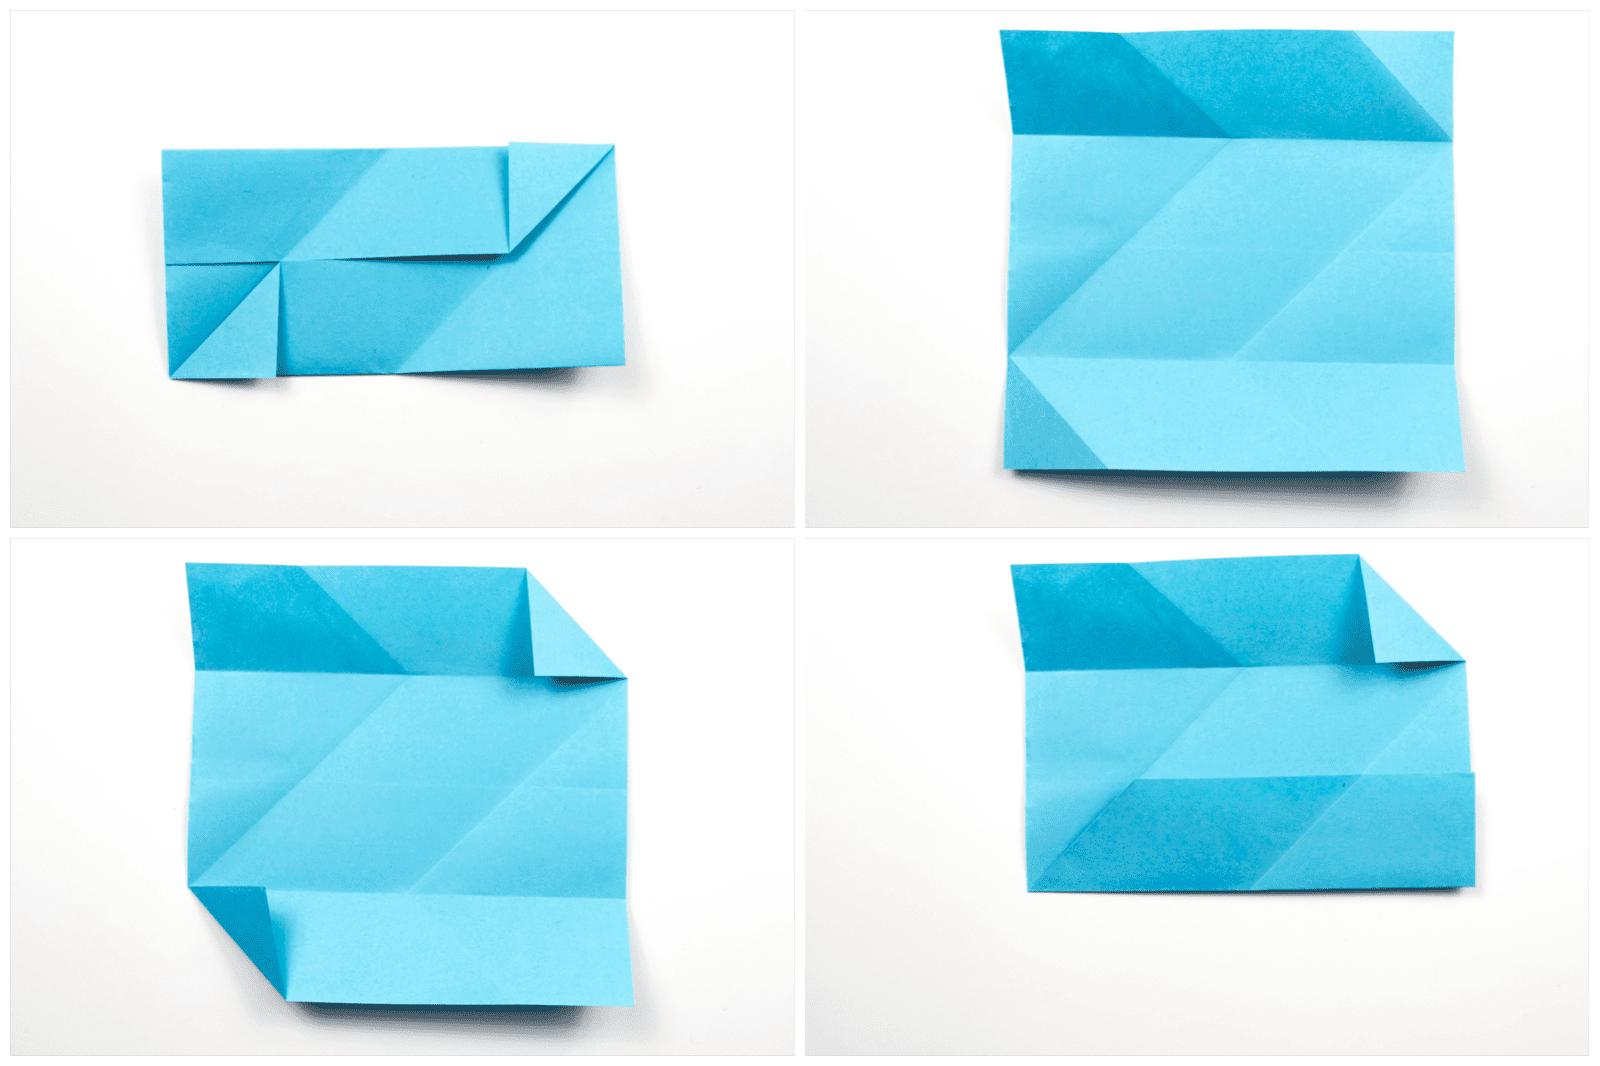 Origami Sonobe wall display step 2